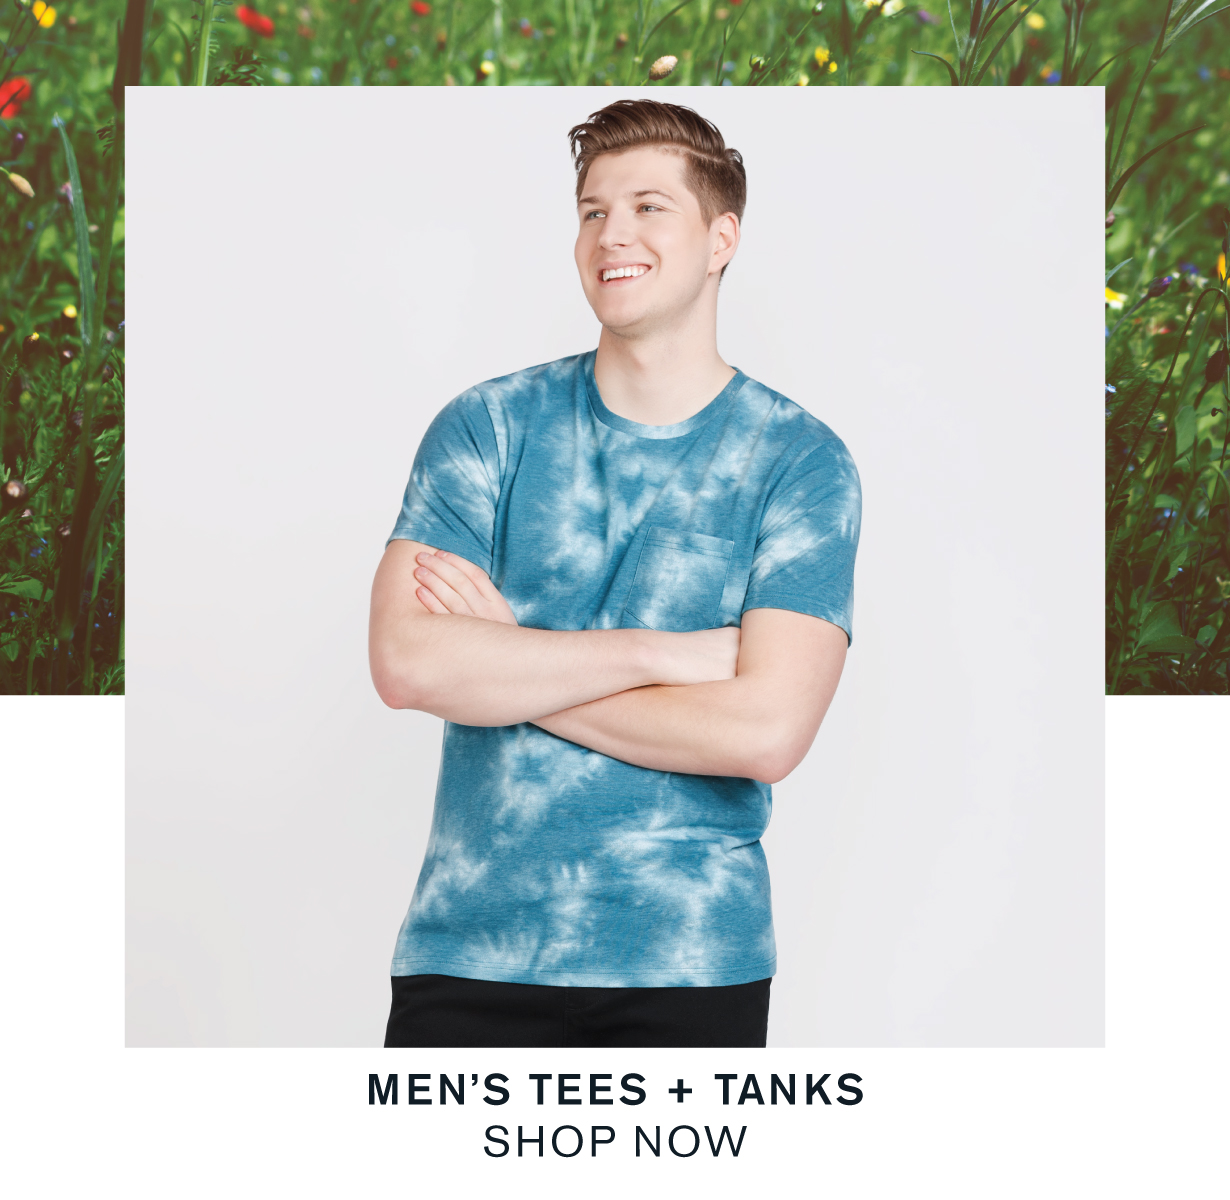 Men's tees and tanks